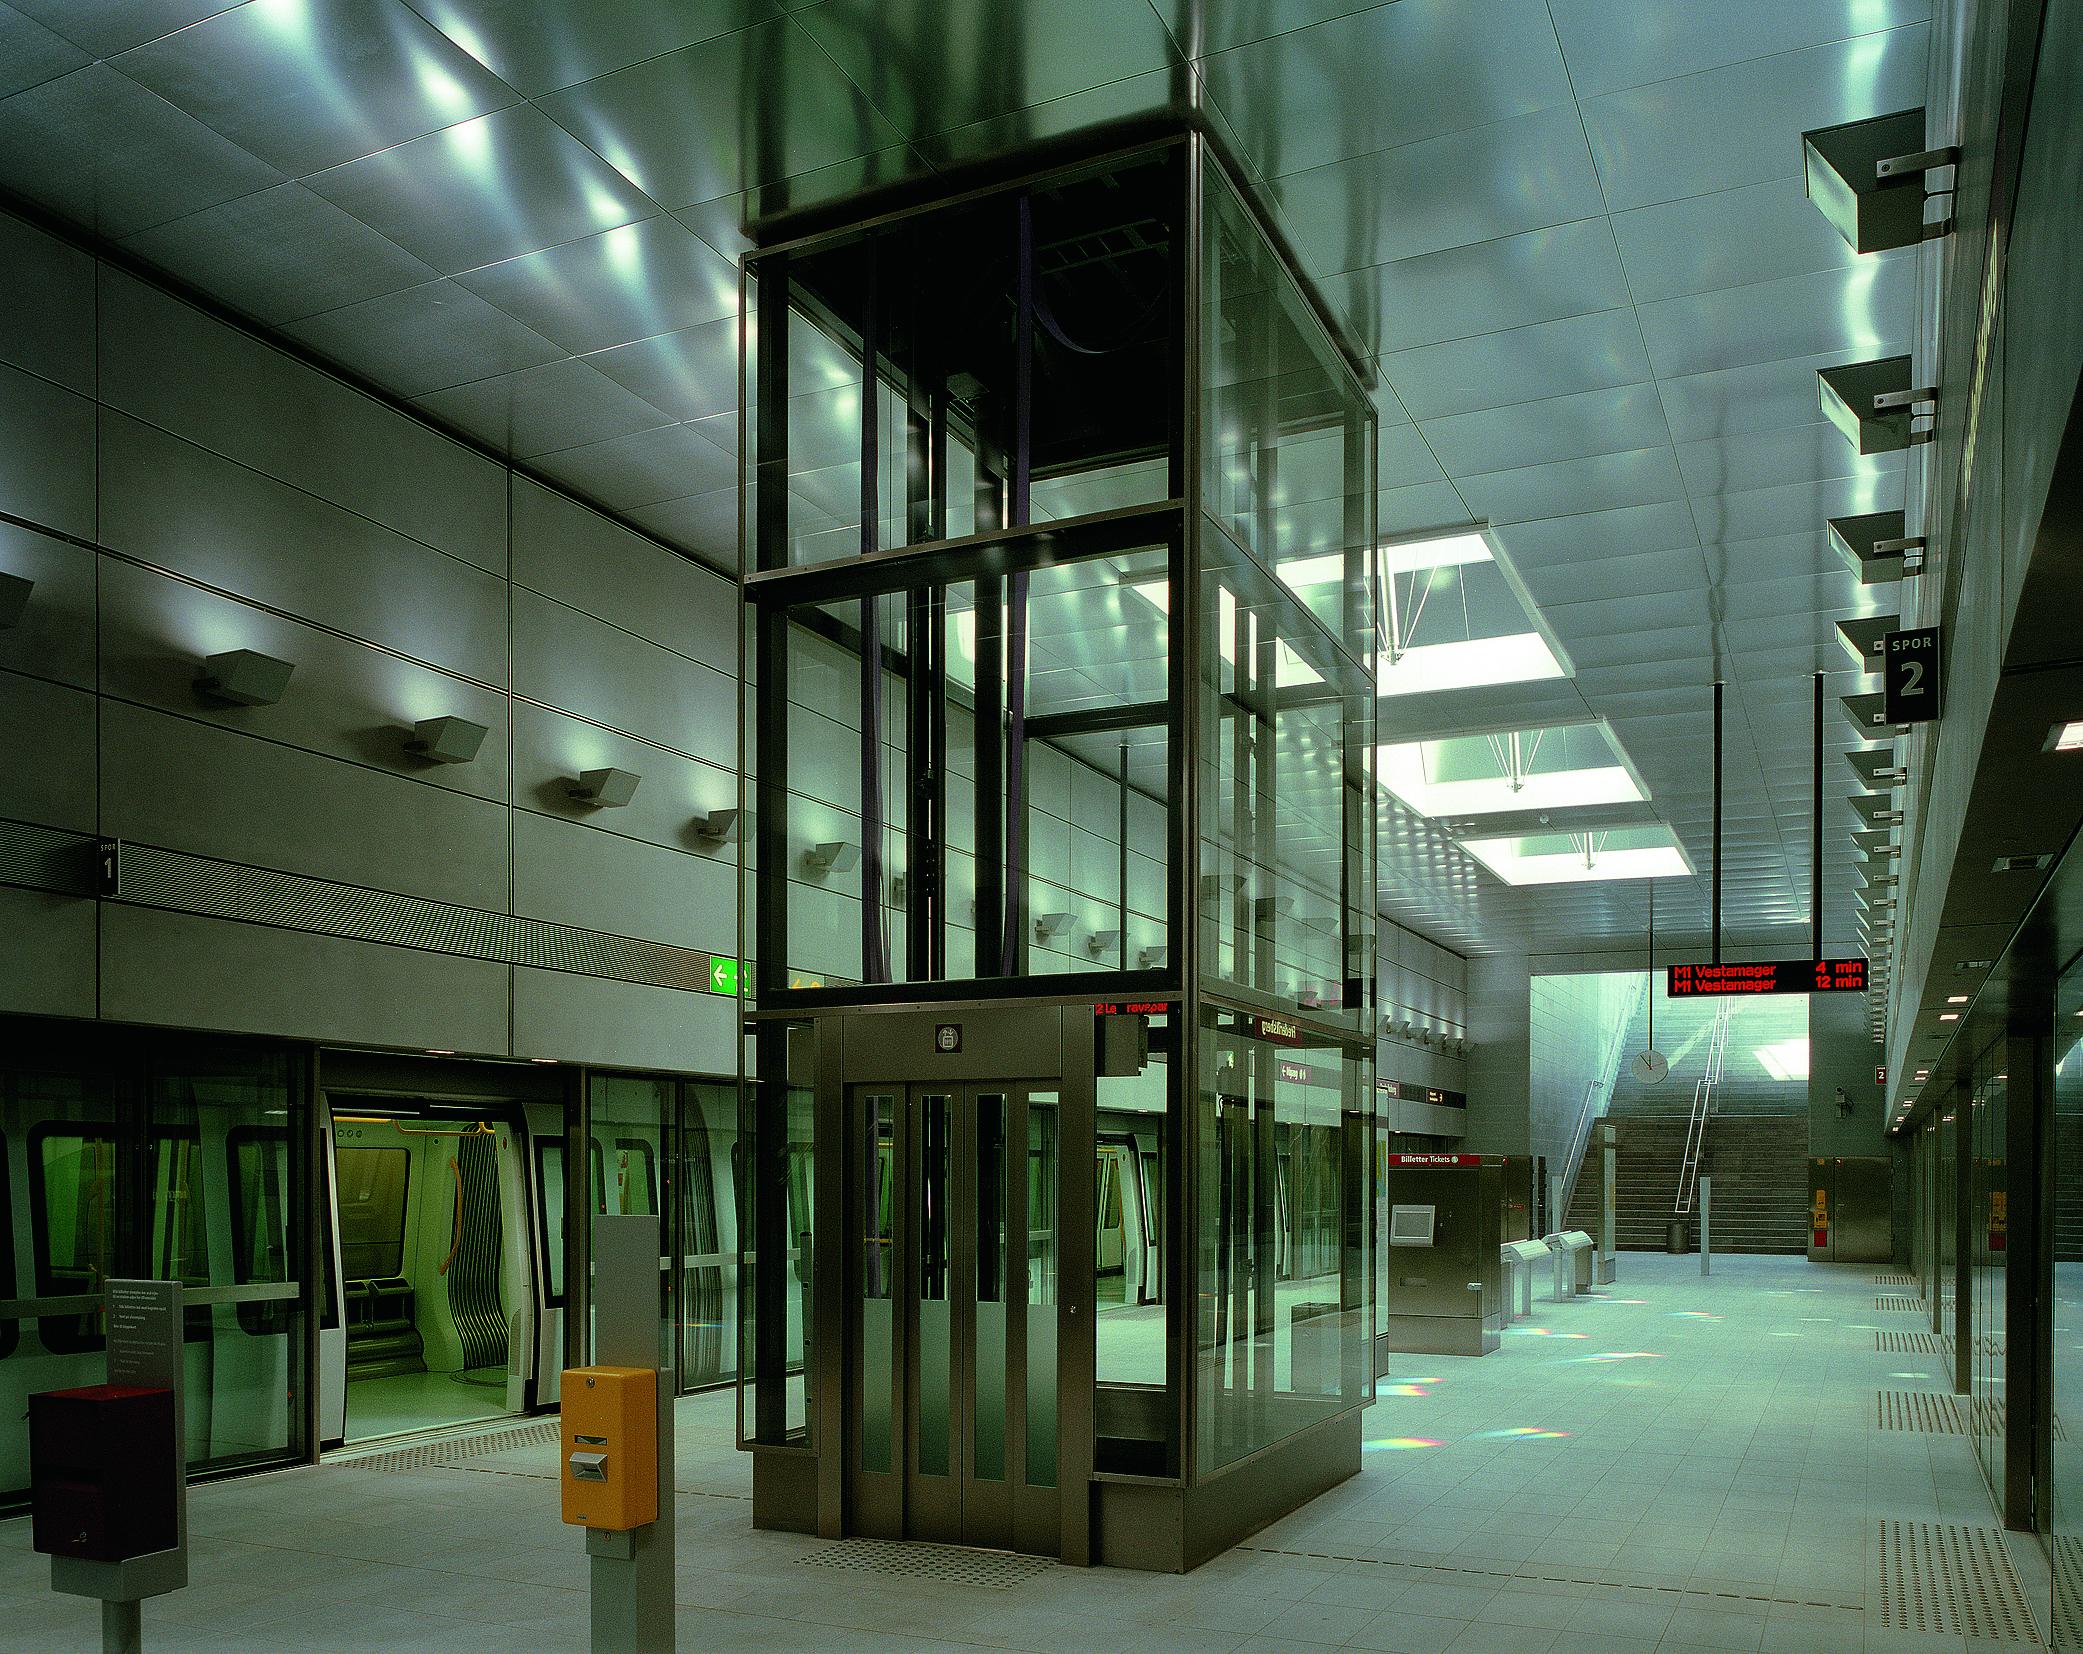 The Copenhagen Metro Universal Design Case Studies